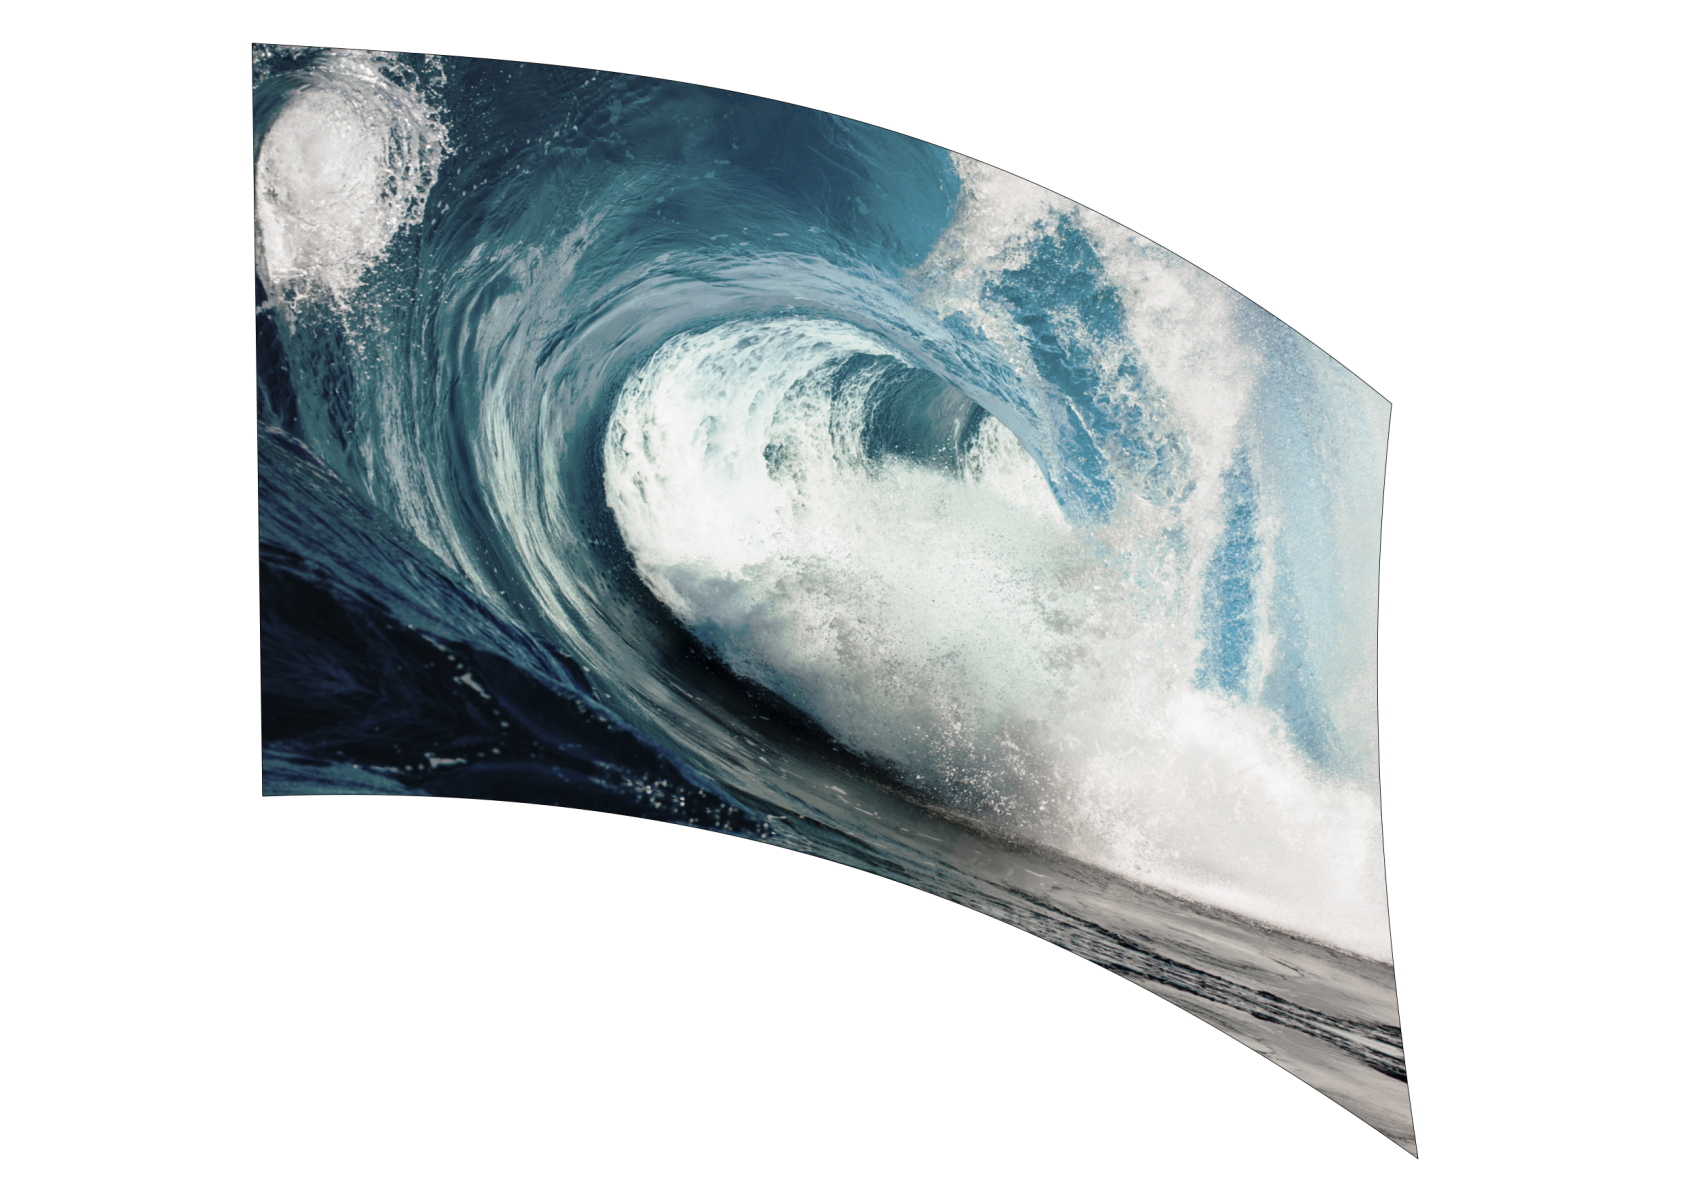 040301s - 36x54 Standard Tidal Wave 1